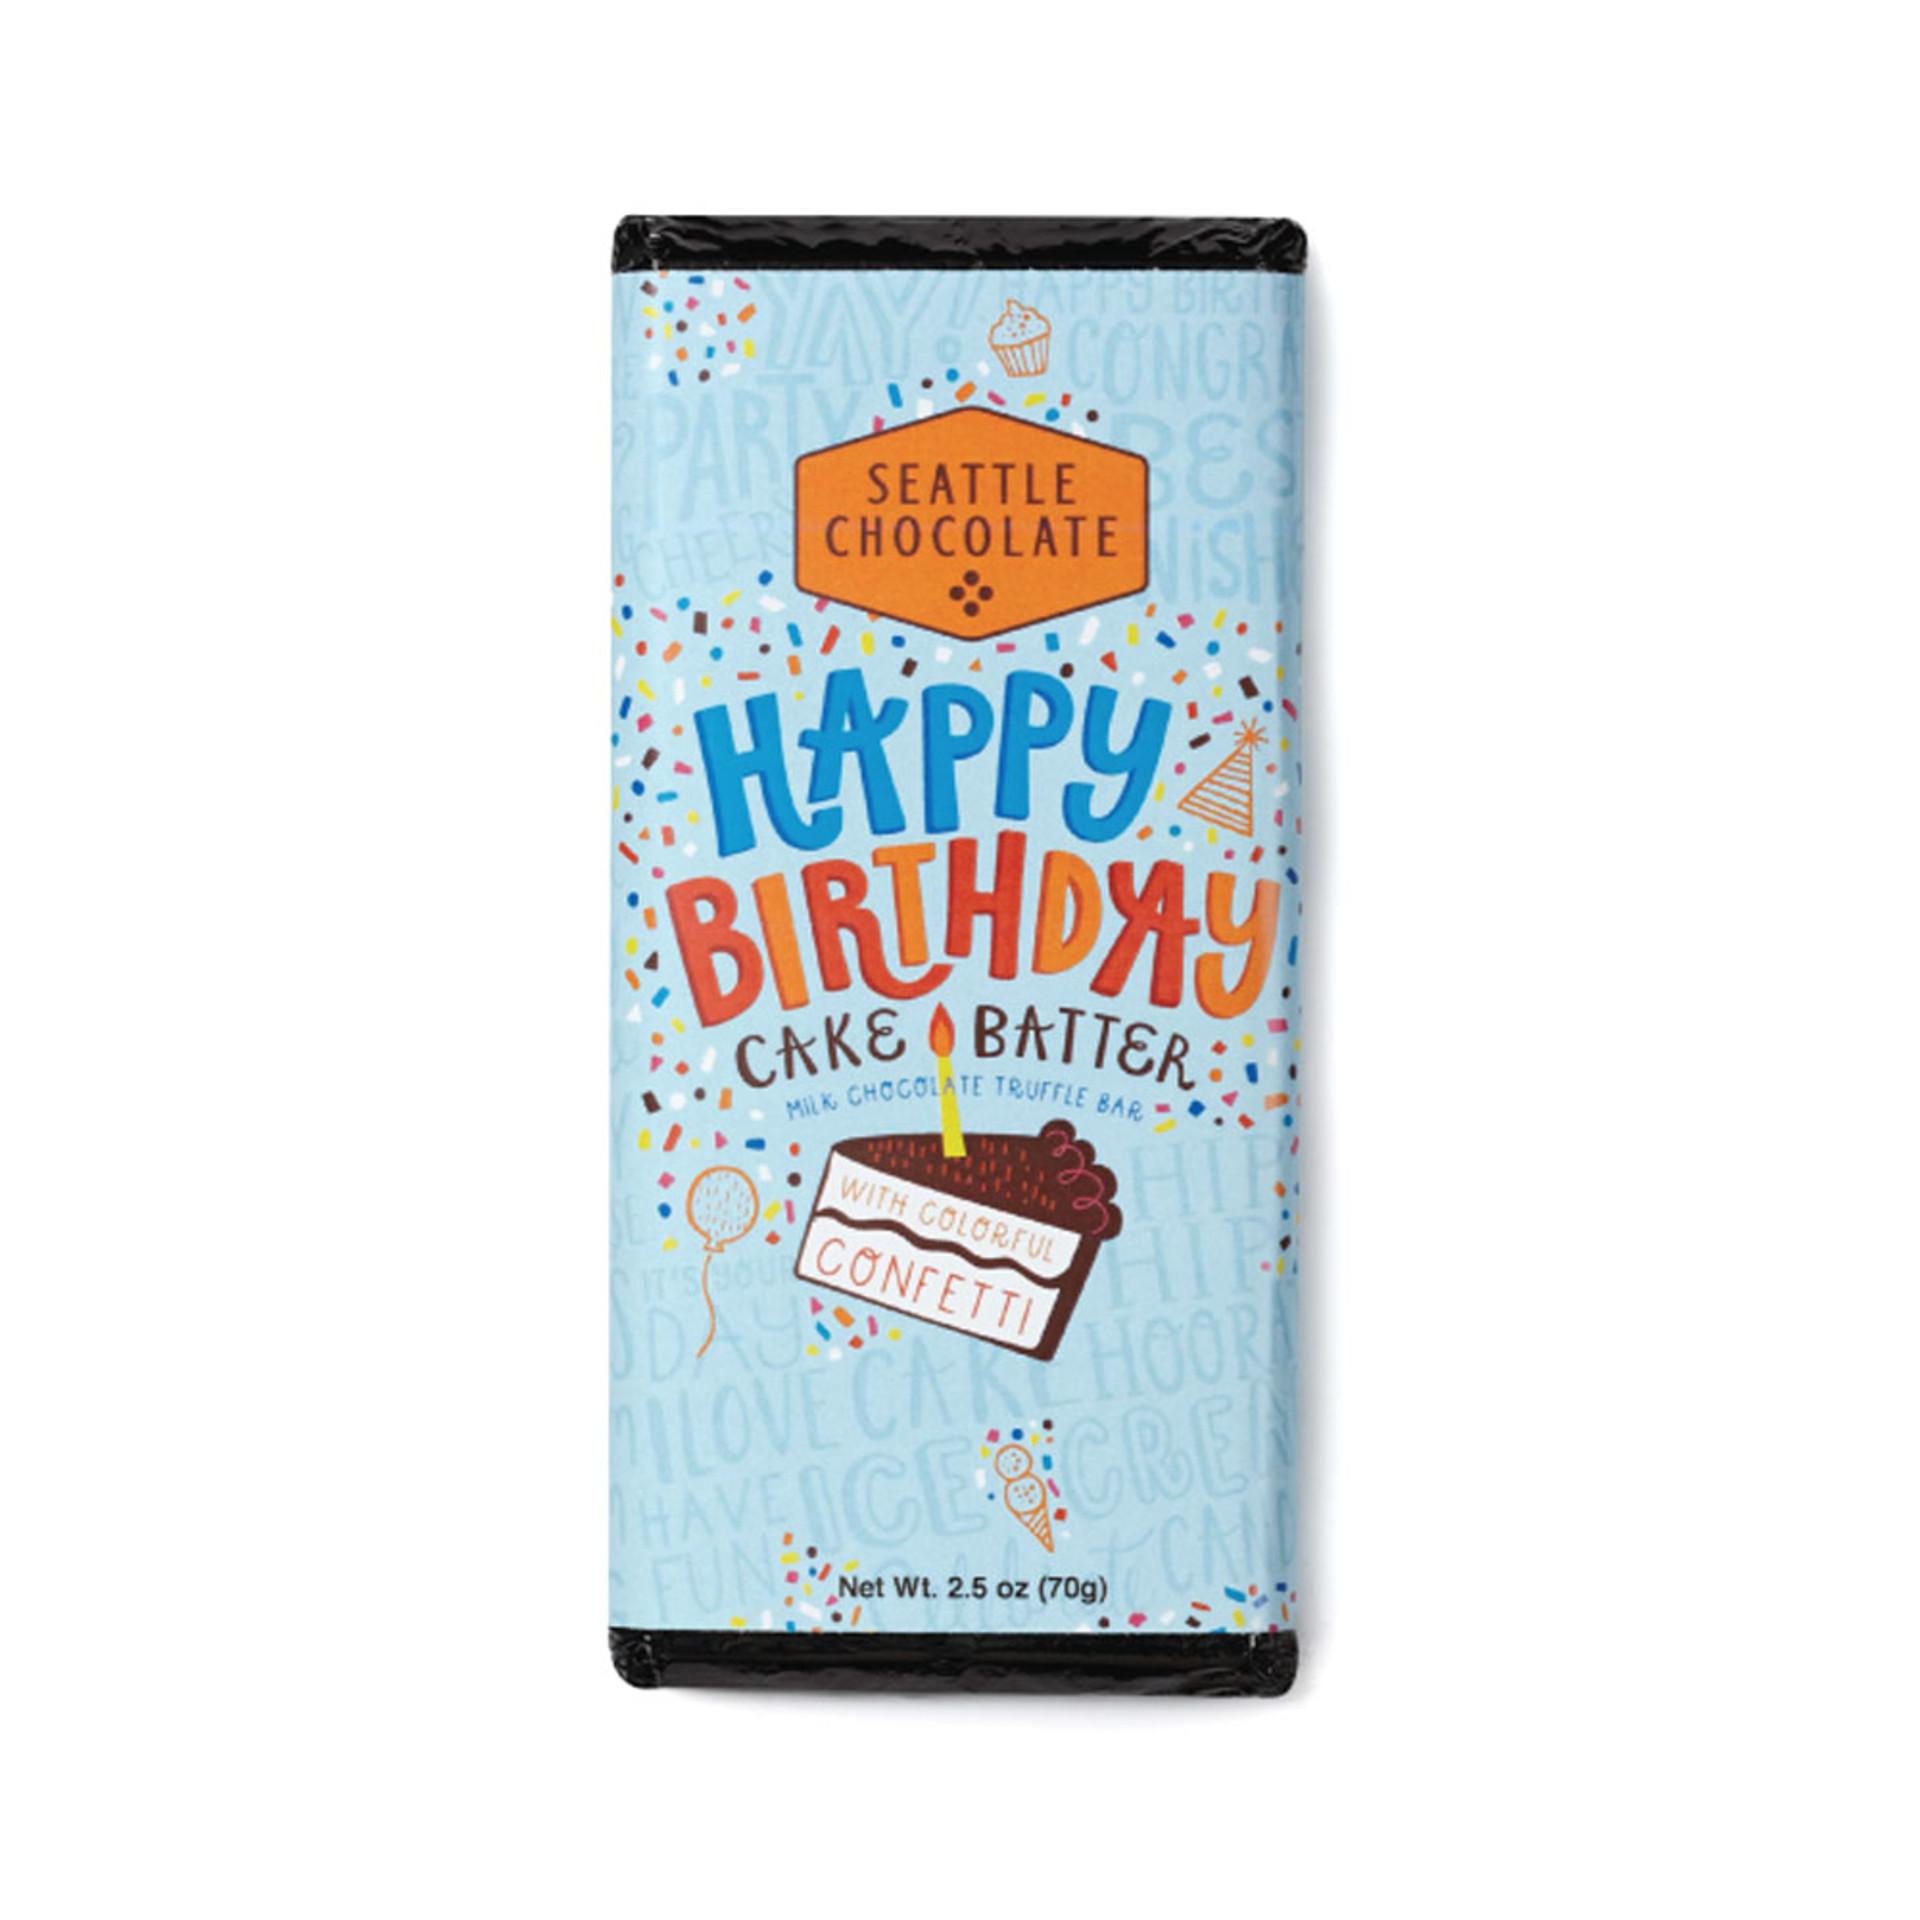 Seattle Chocolates Birthday Cake Truffle Bar